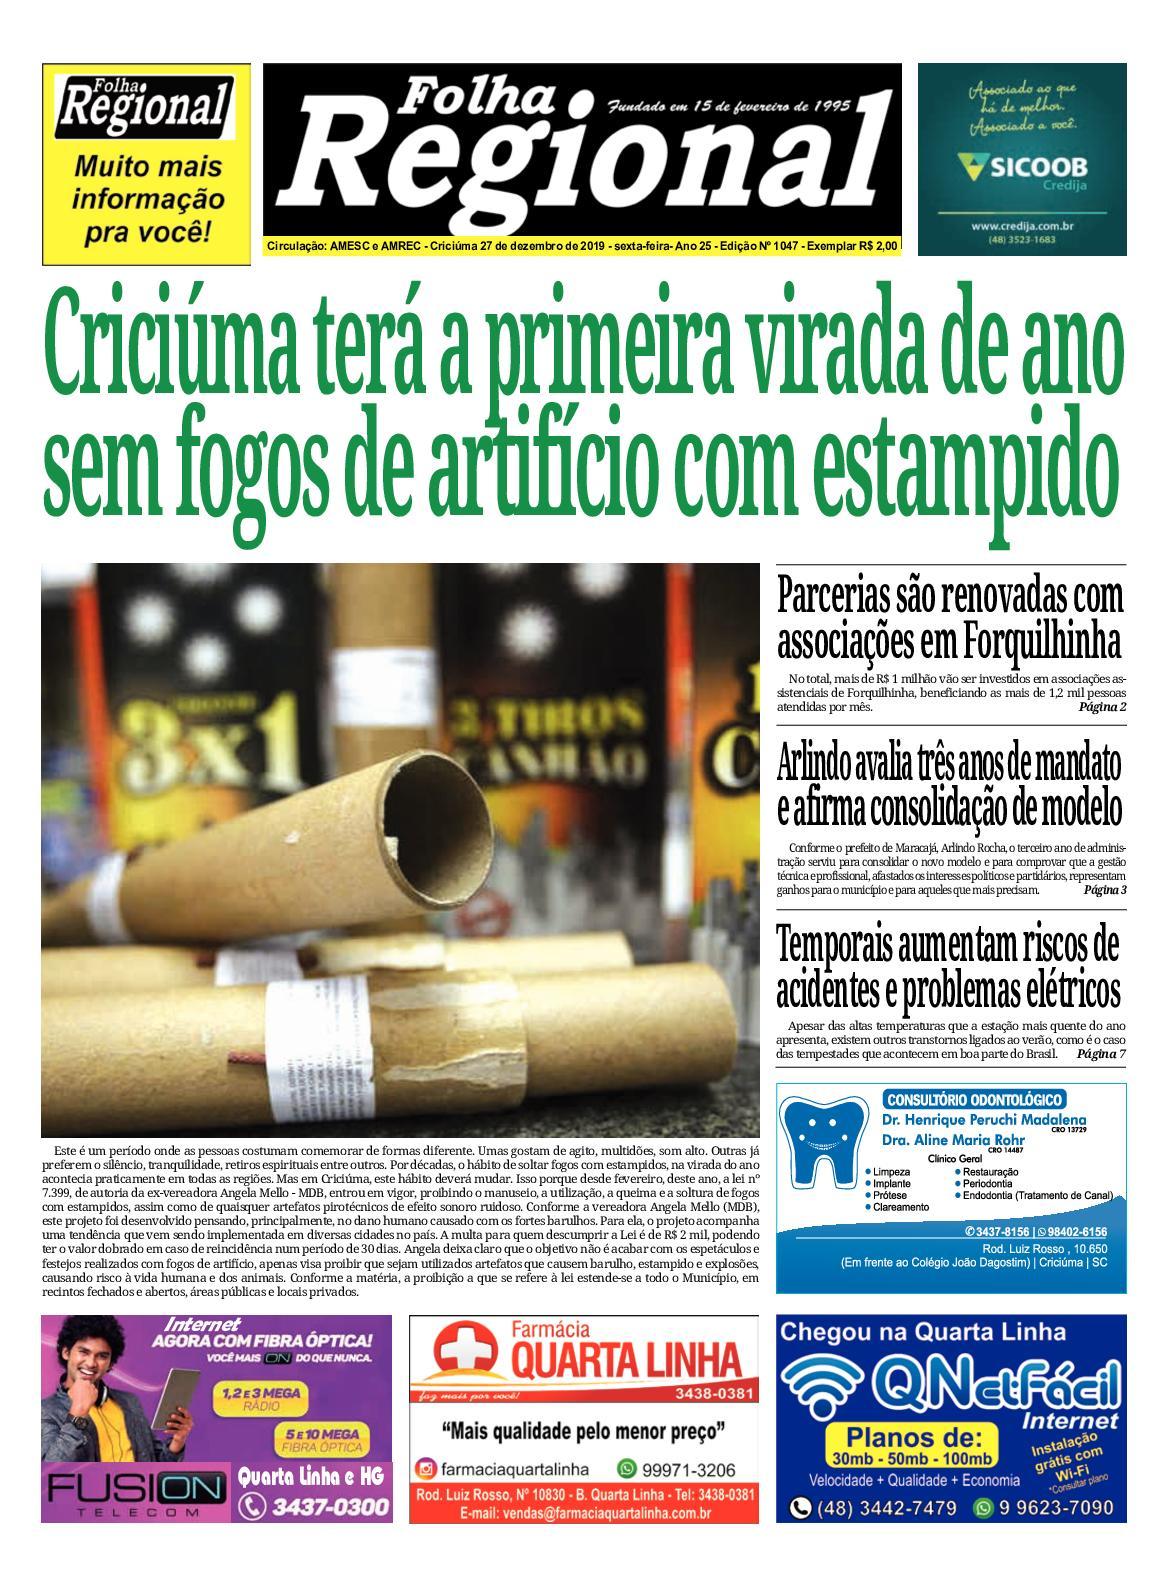 Folha Regional Ed.1047 - 27/12/2019